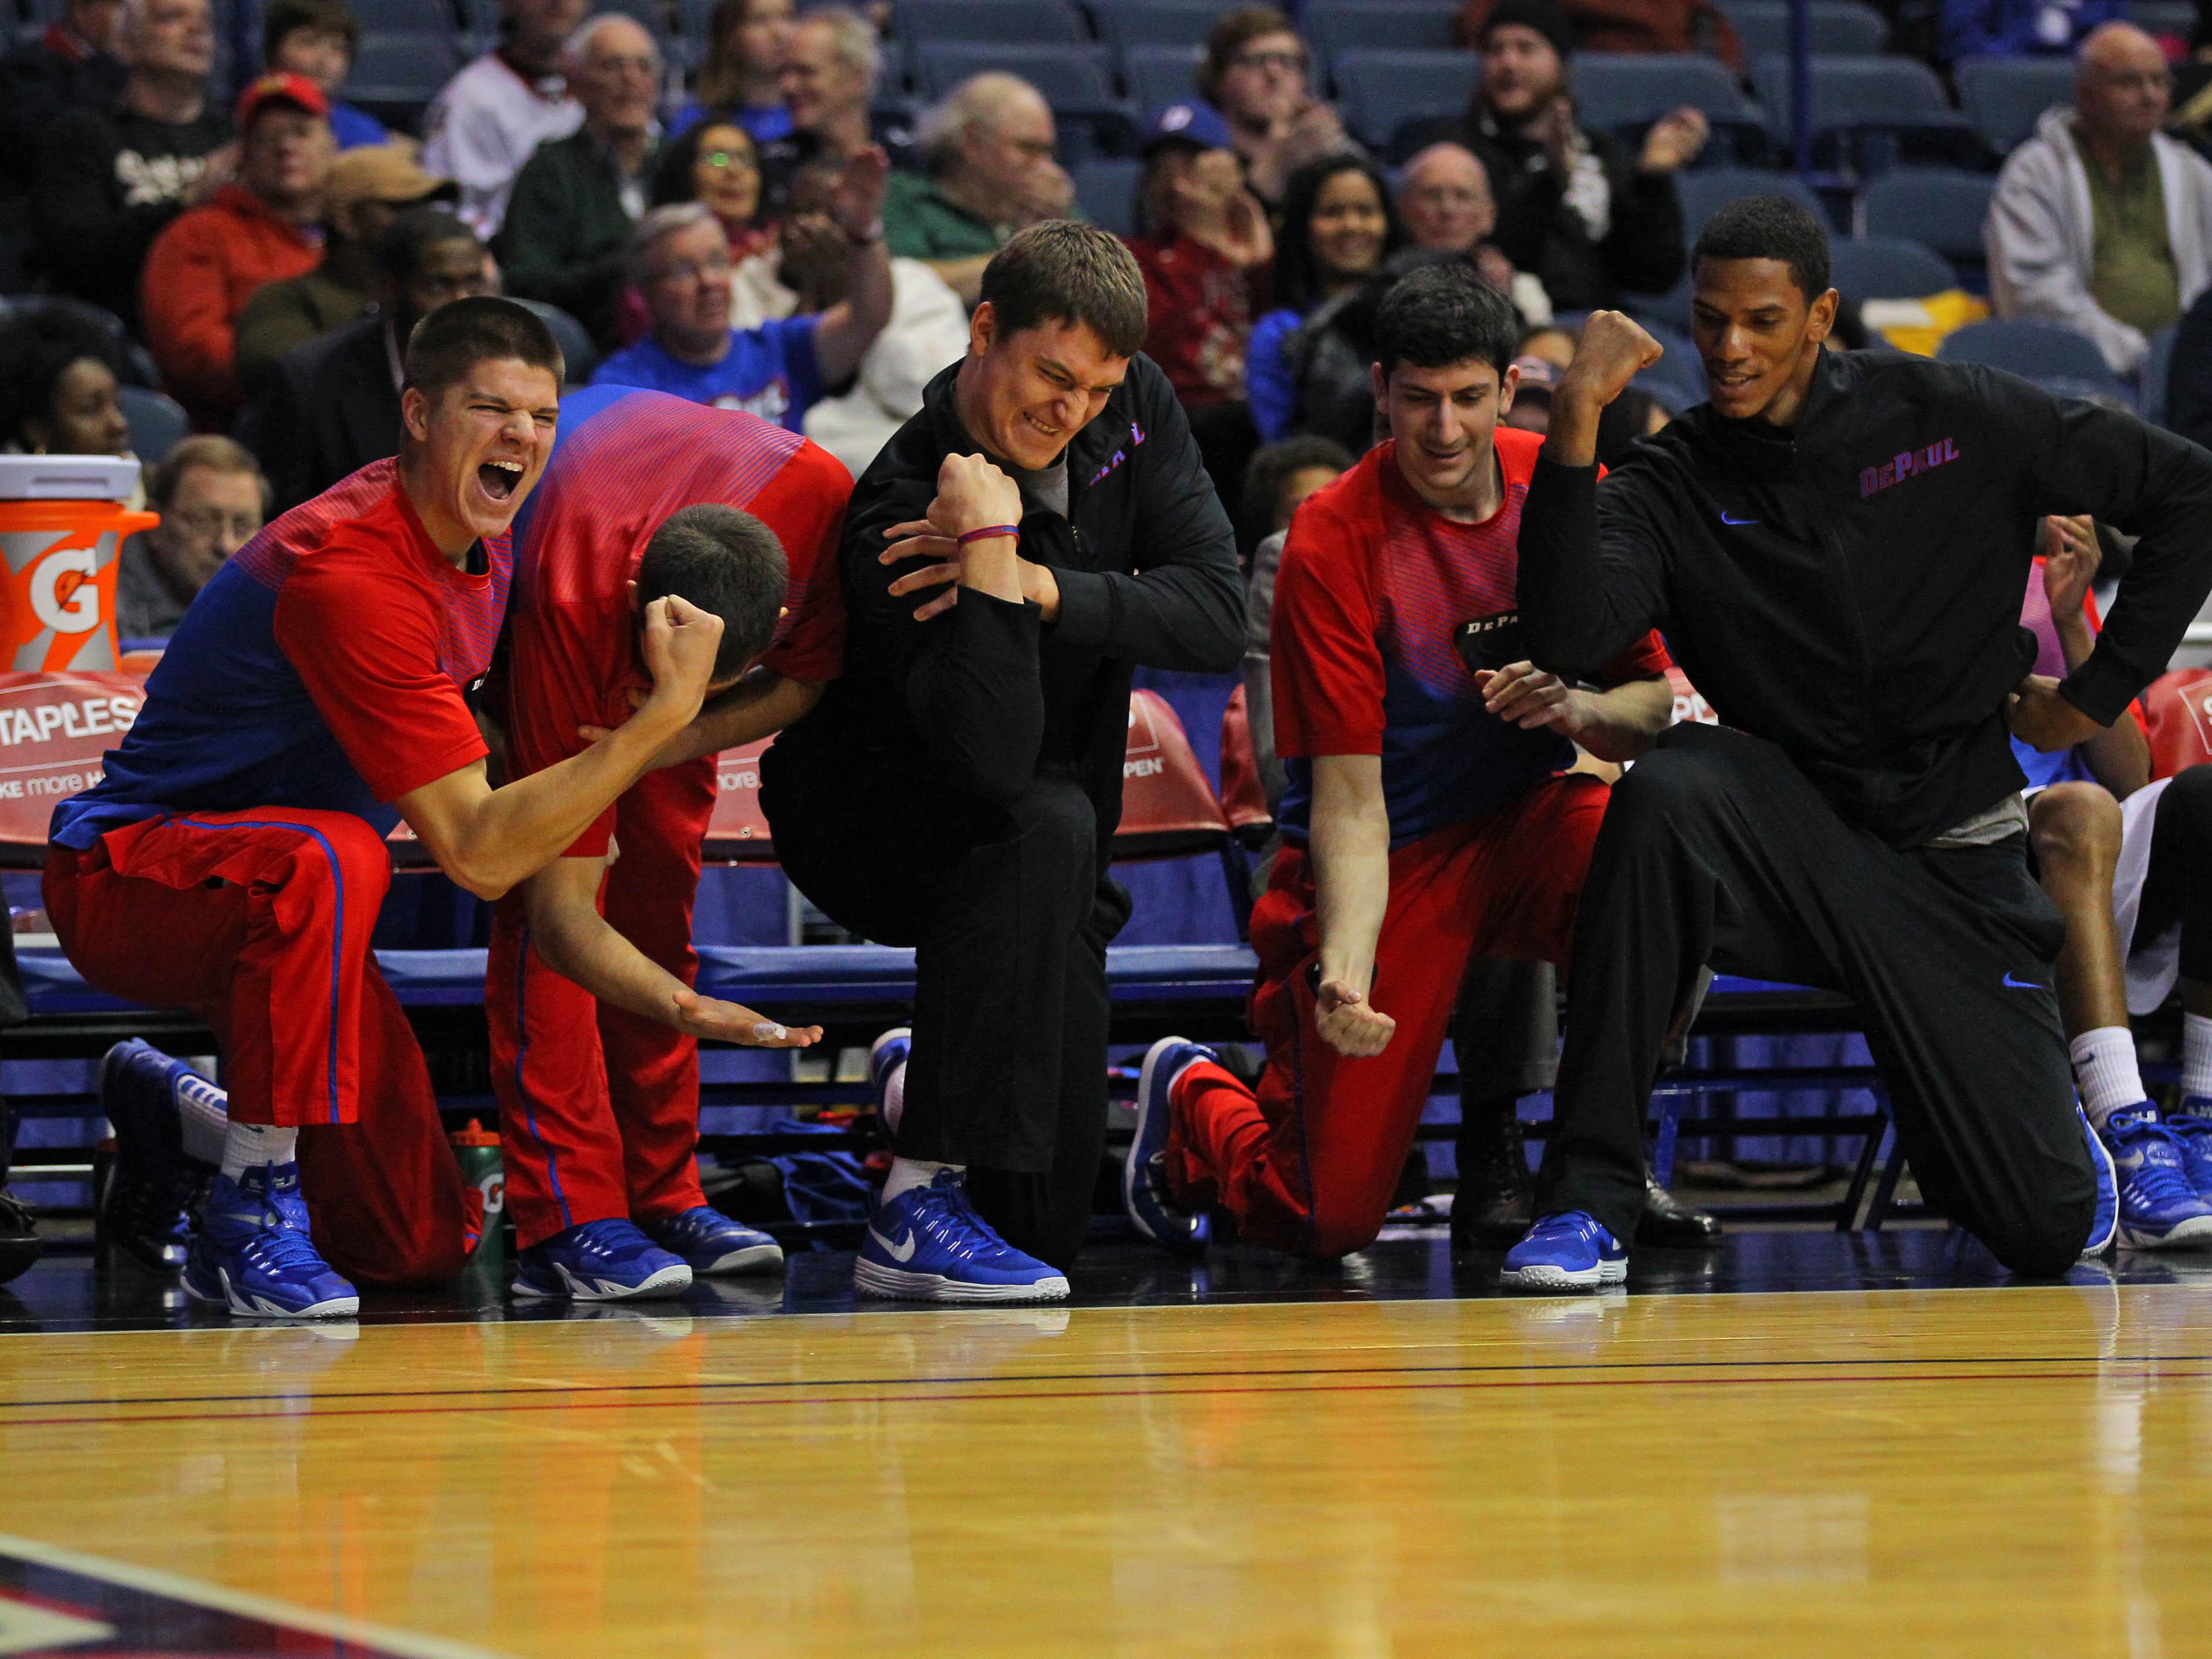 DePaul's bench demonstrating what actual team spirit looks like.